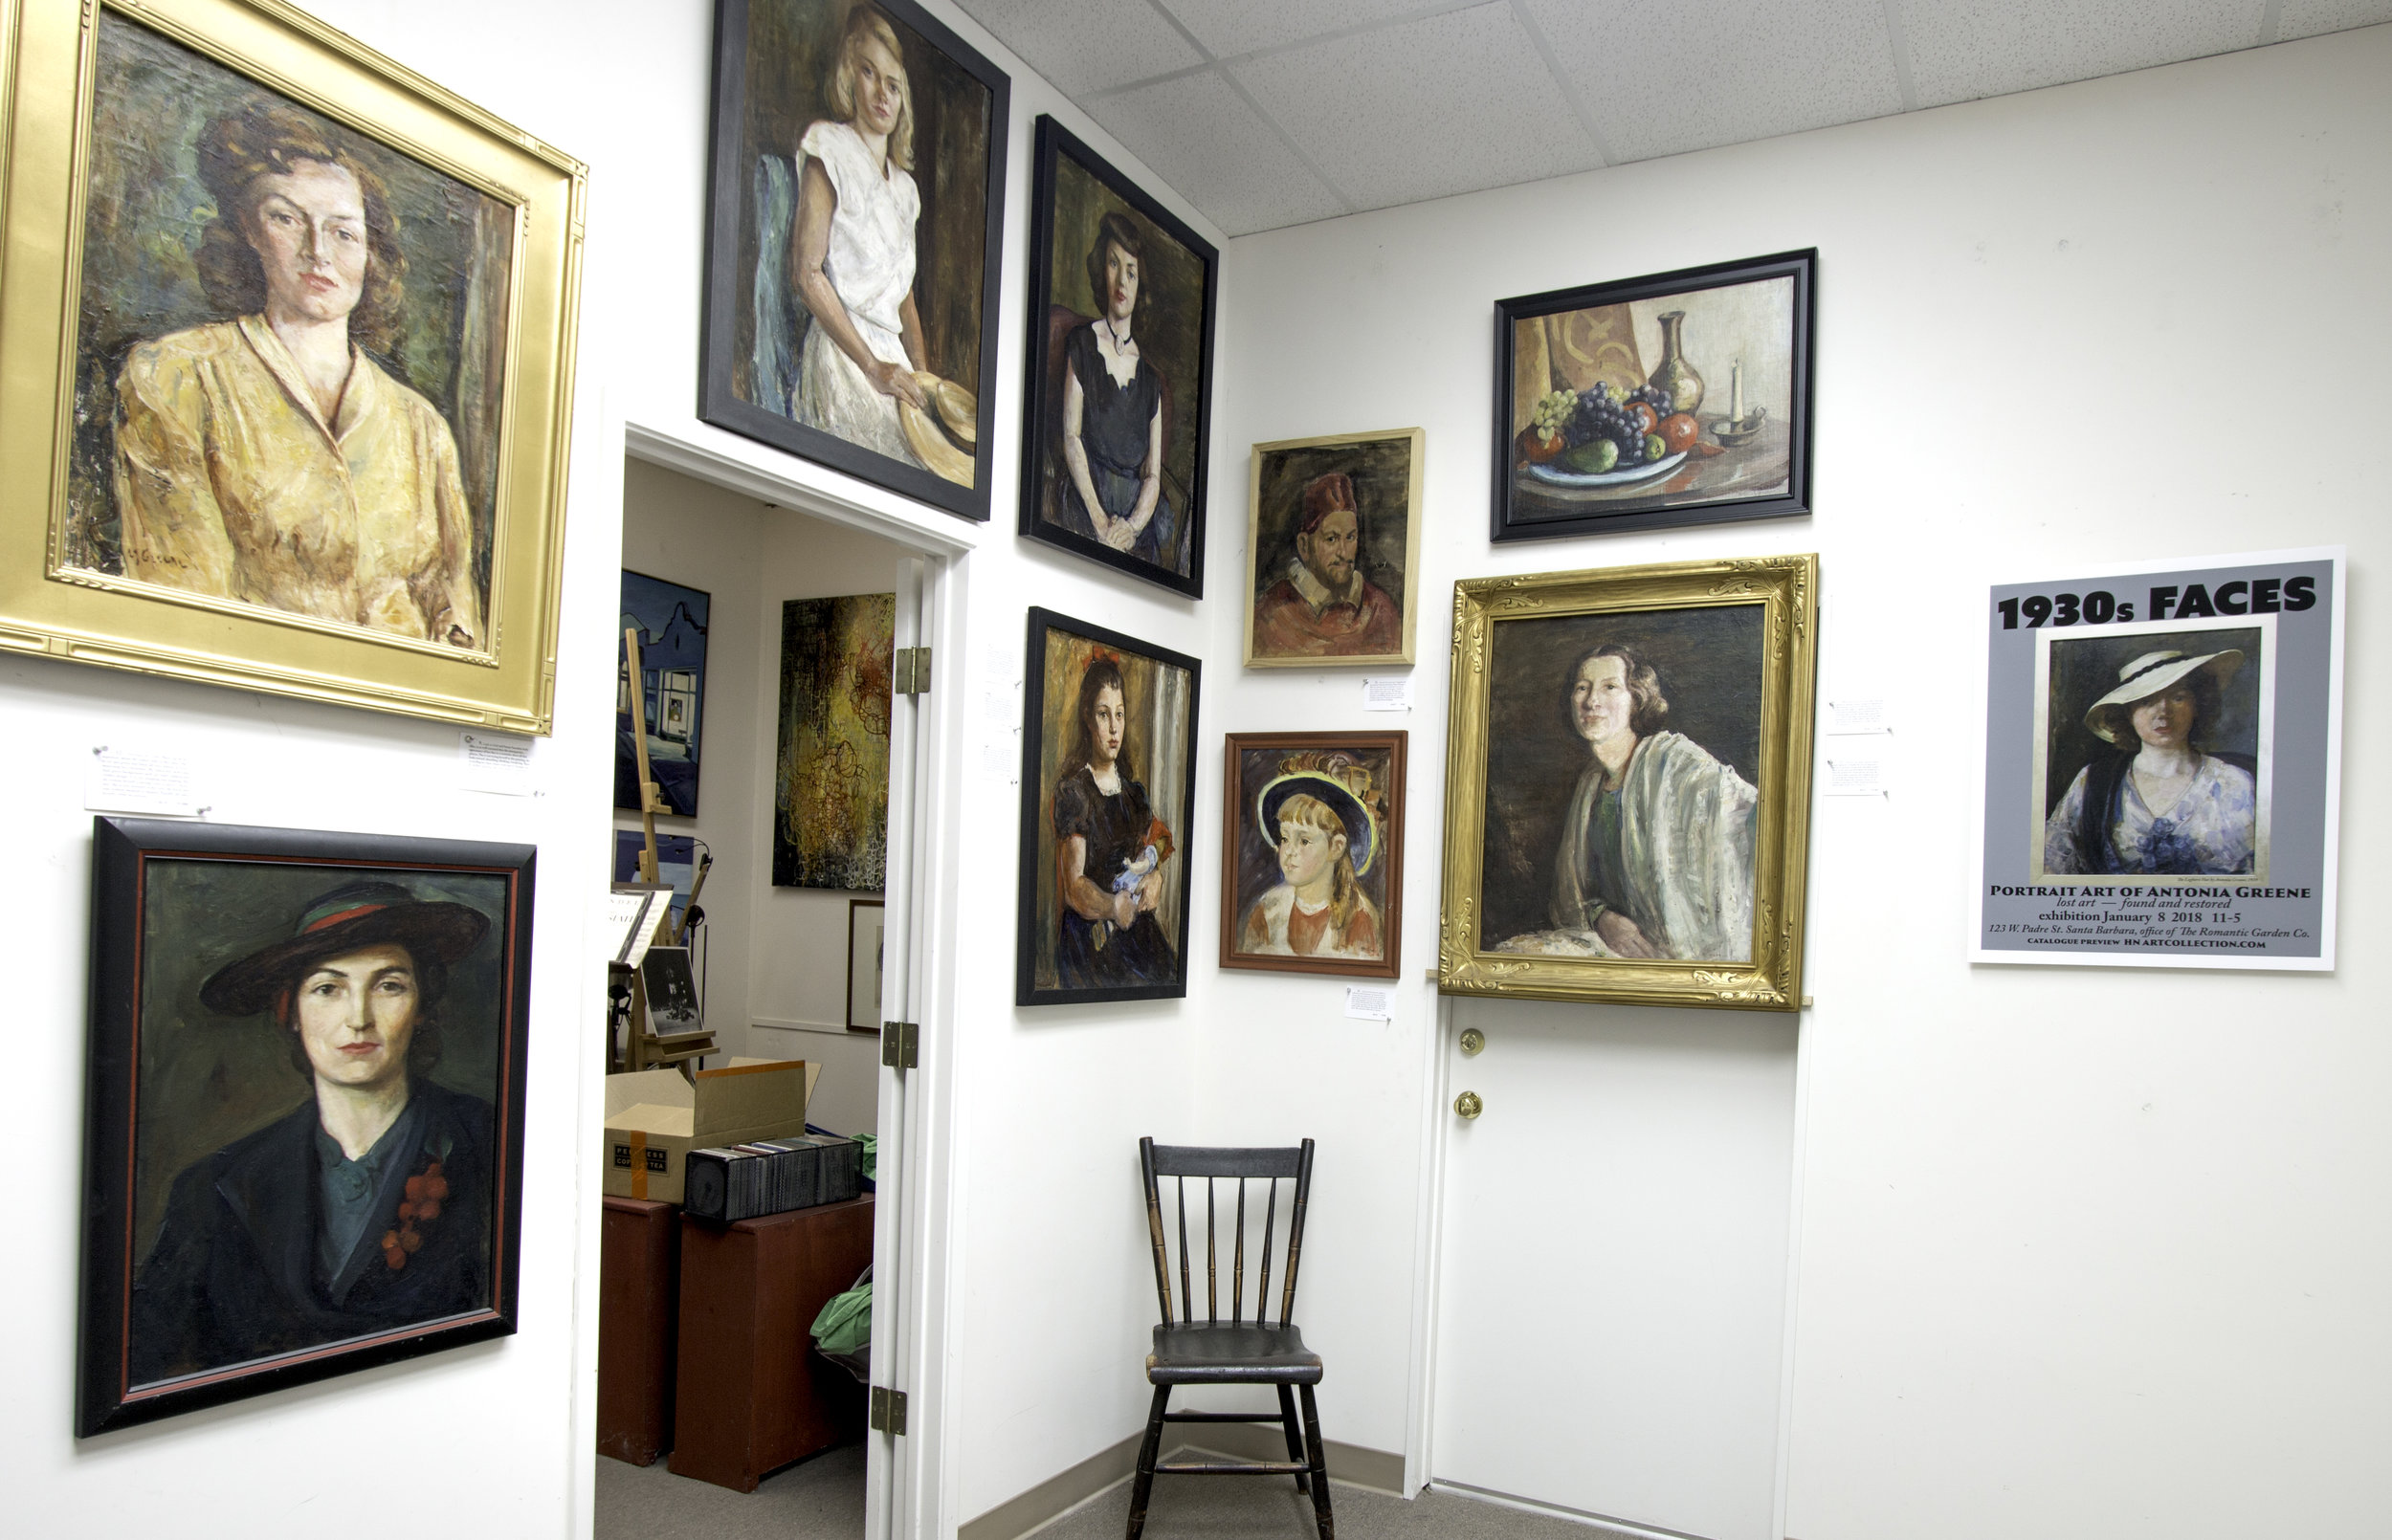 EXHIBIT BEFORE EXHIBIT — Empty chair is symbol of Antonia Greene's art inviting consumers.